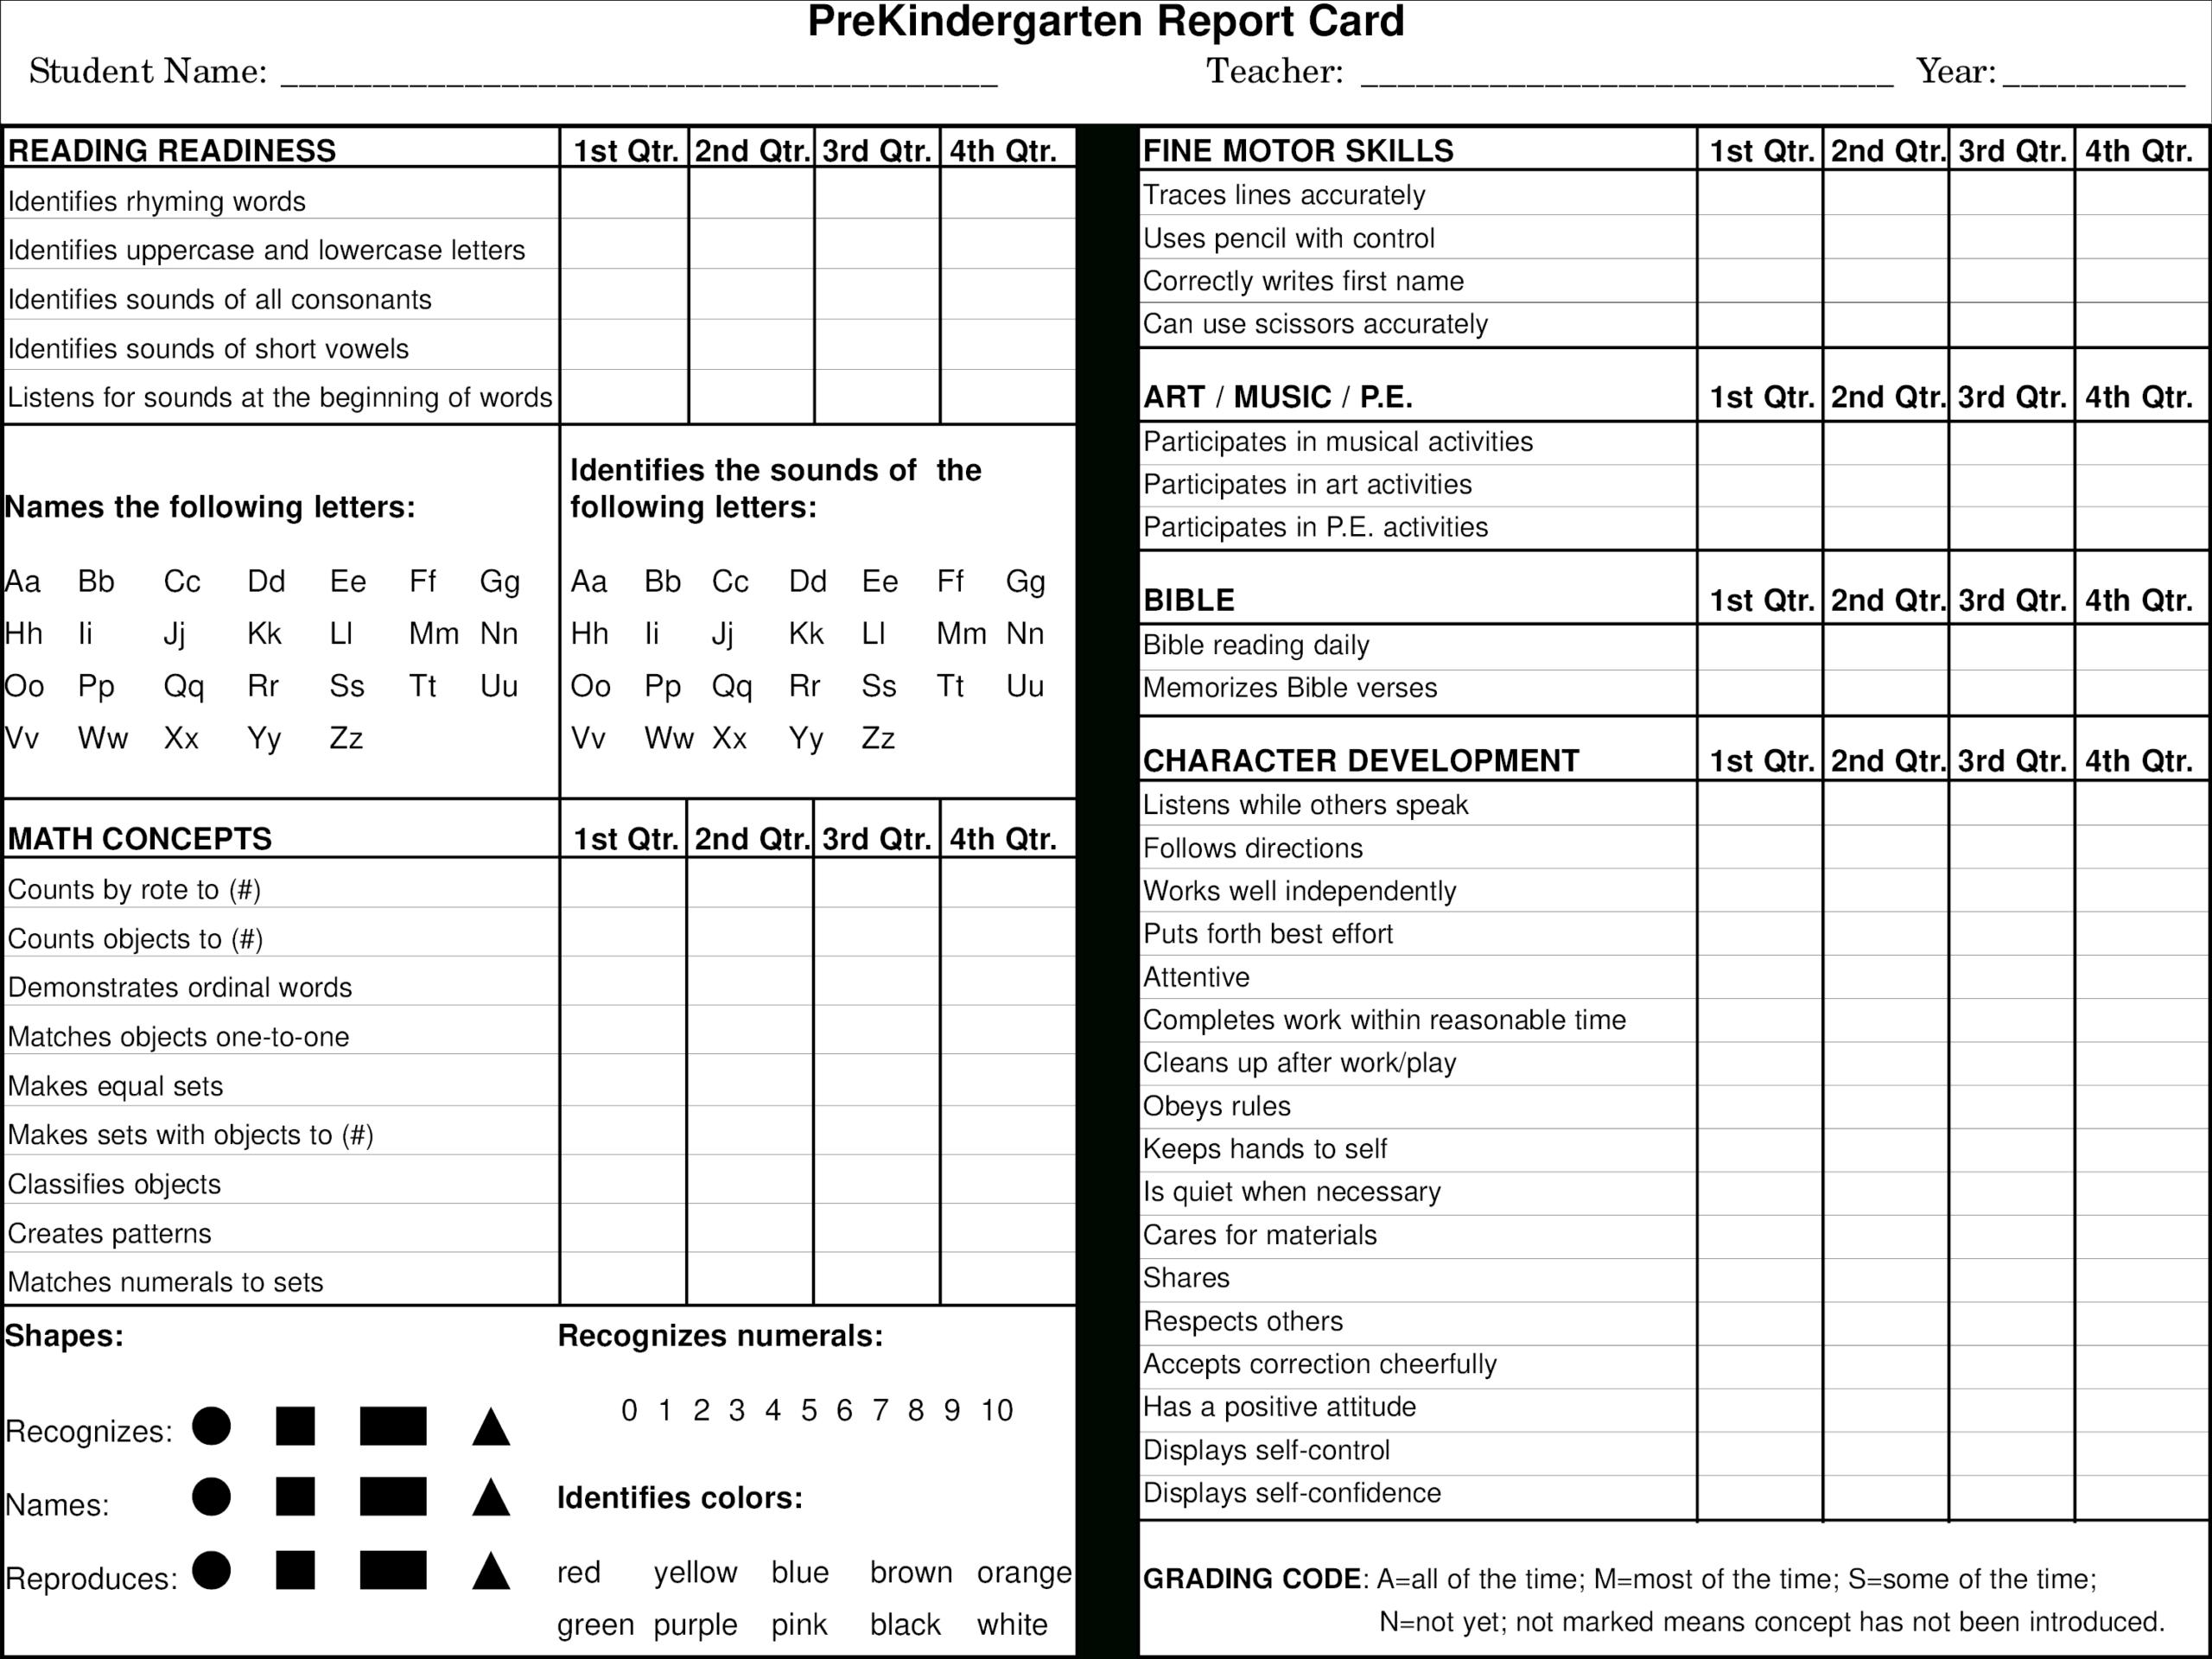 Preschool Report Card Main Image – Preschool Progress Report For Character Report Card Template